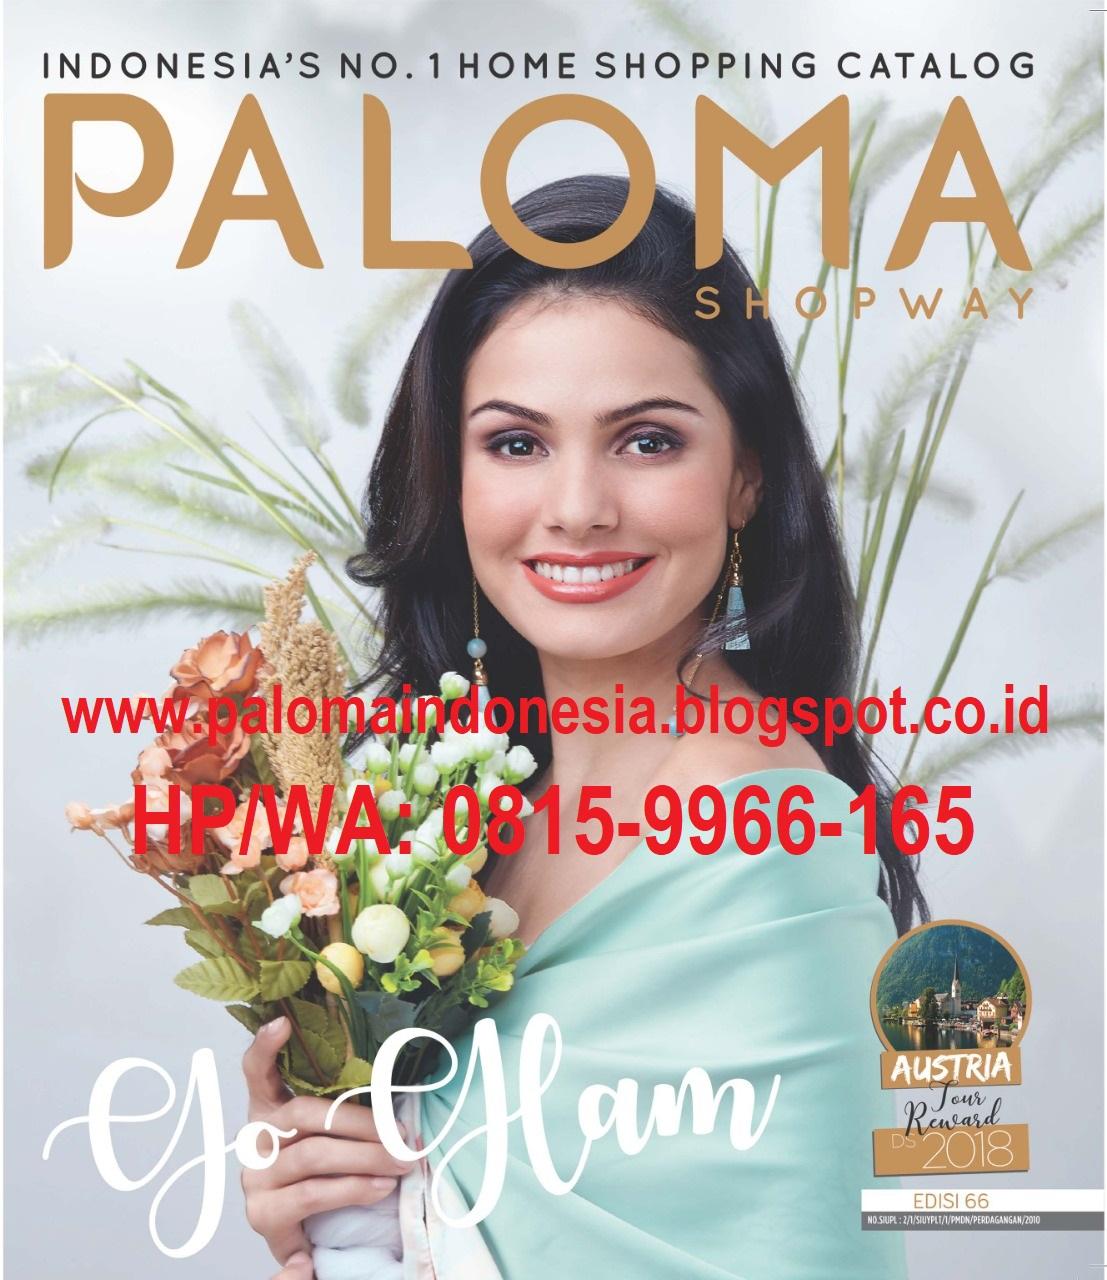 Paloma Shopway Indonesia Rkb Tegal Sarung Bantal Flanel Katalog Terbaru Edisi 66 Tahun 2018